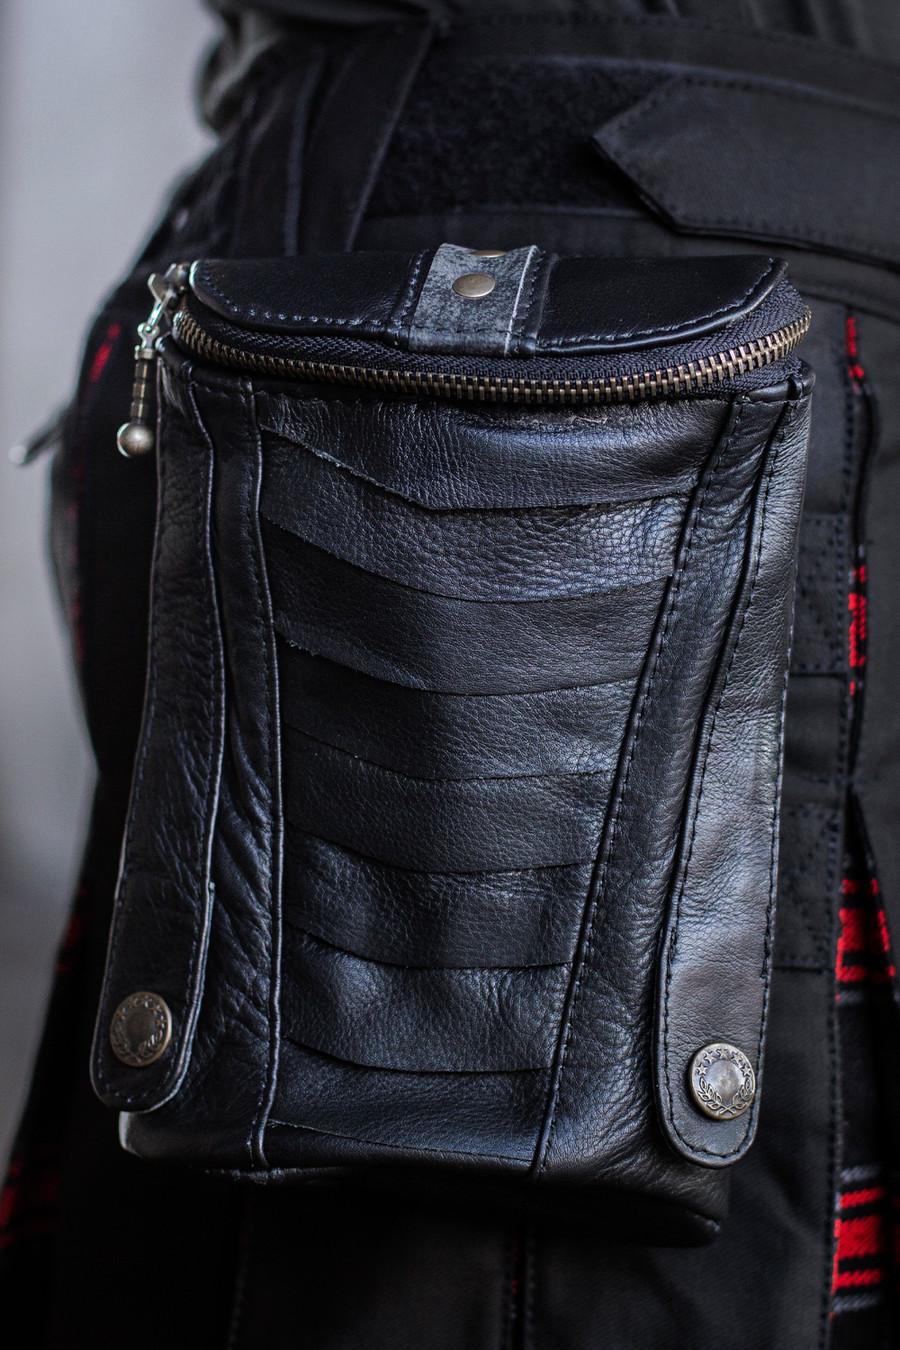 Leather XL Cargo Pocket V2 w/ Antique Black on a Warlord Versatta Hybrid Kilt.